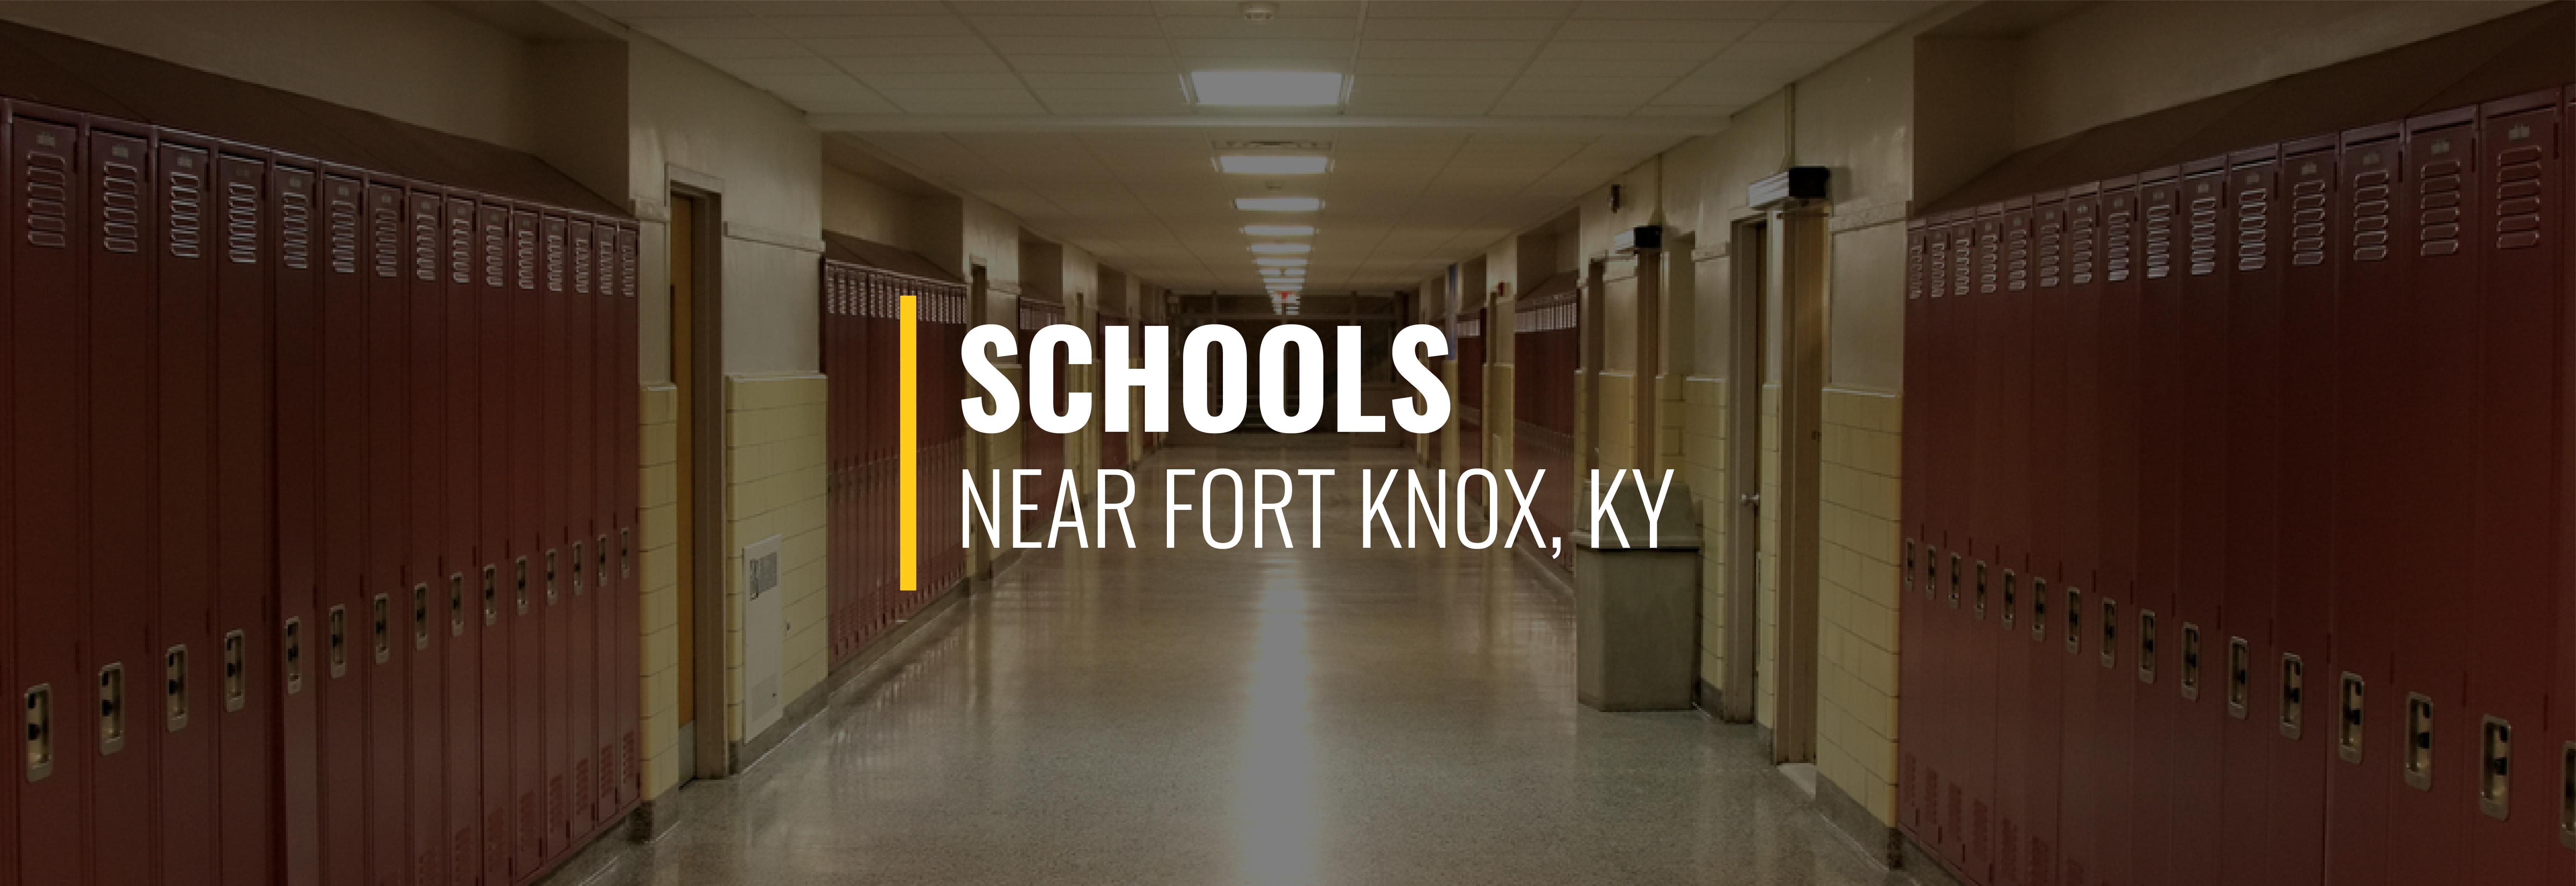 Fort Knox Schools